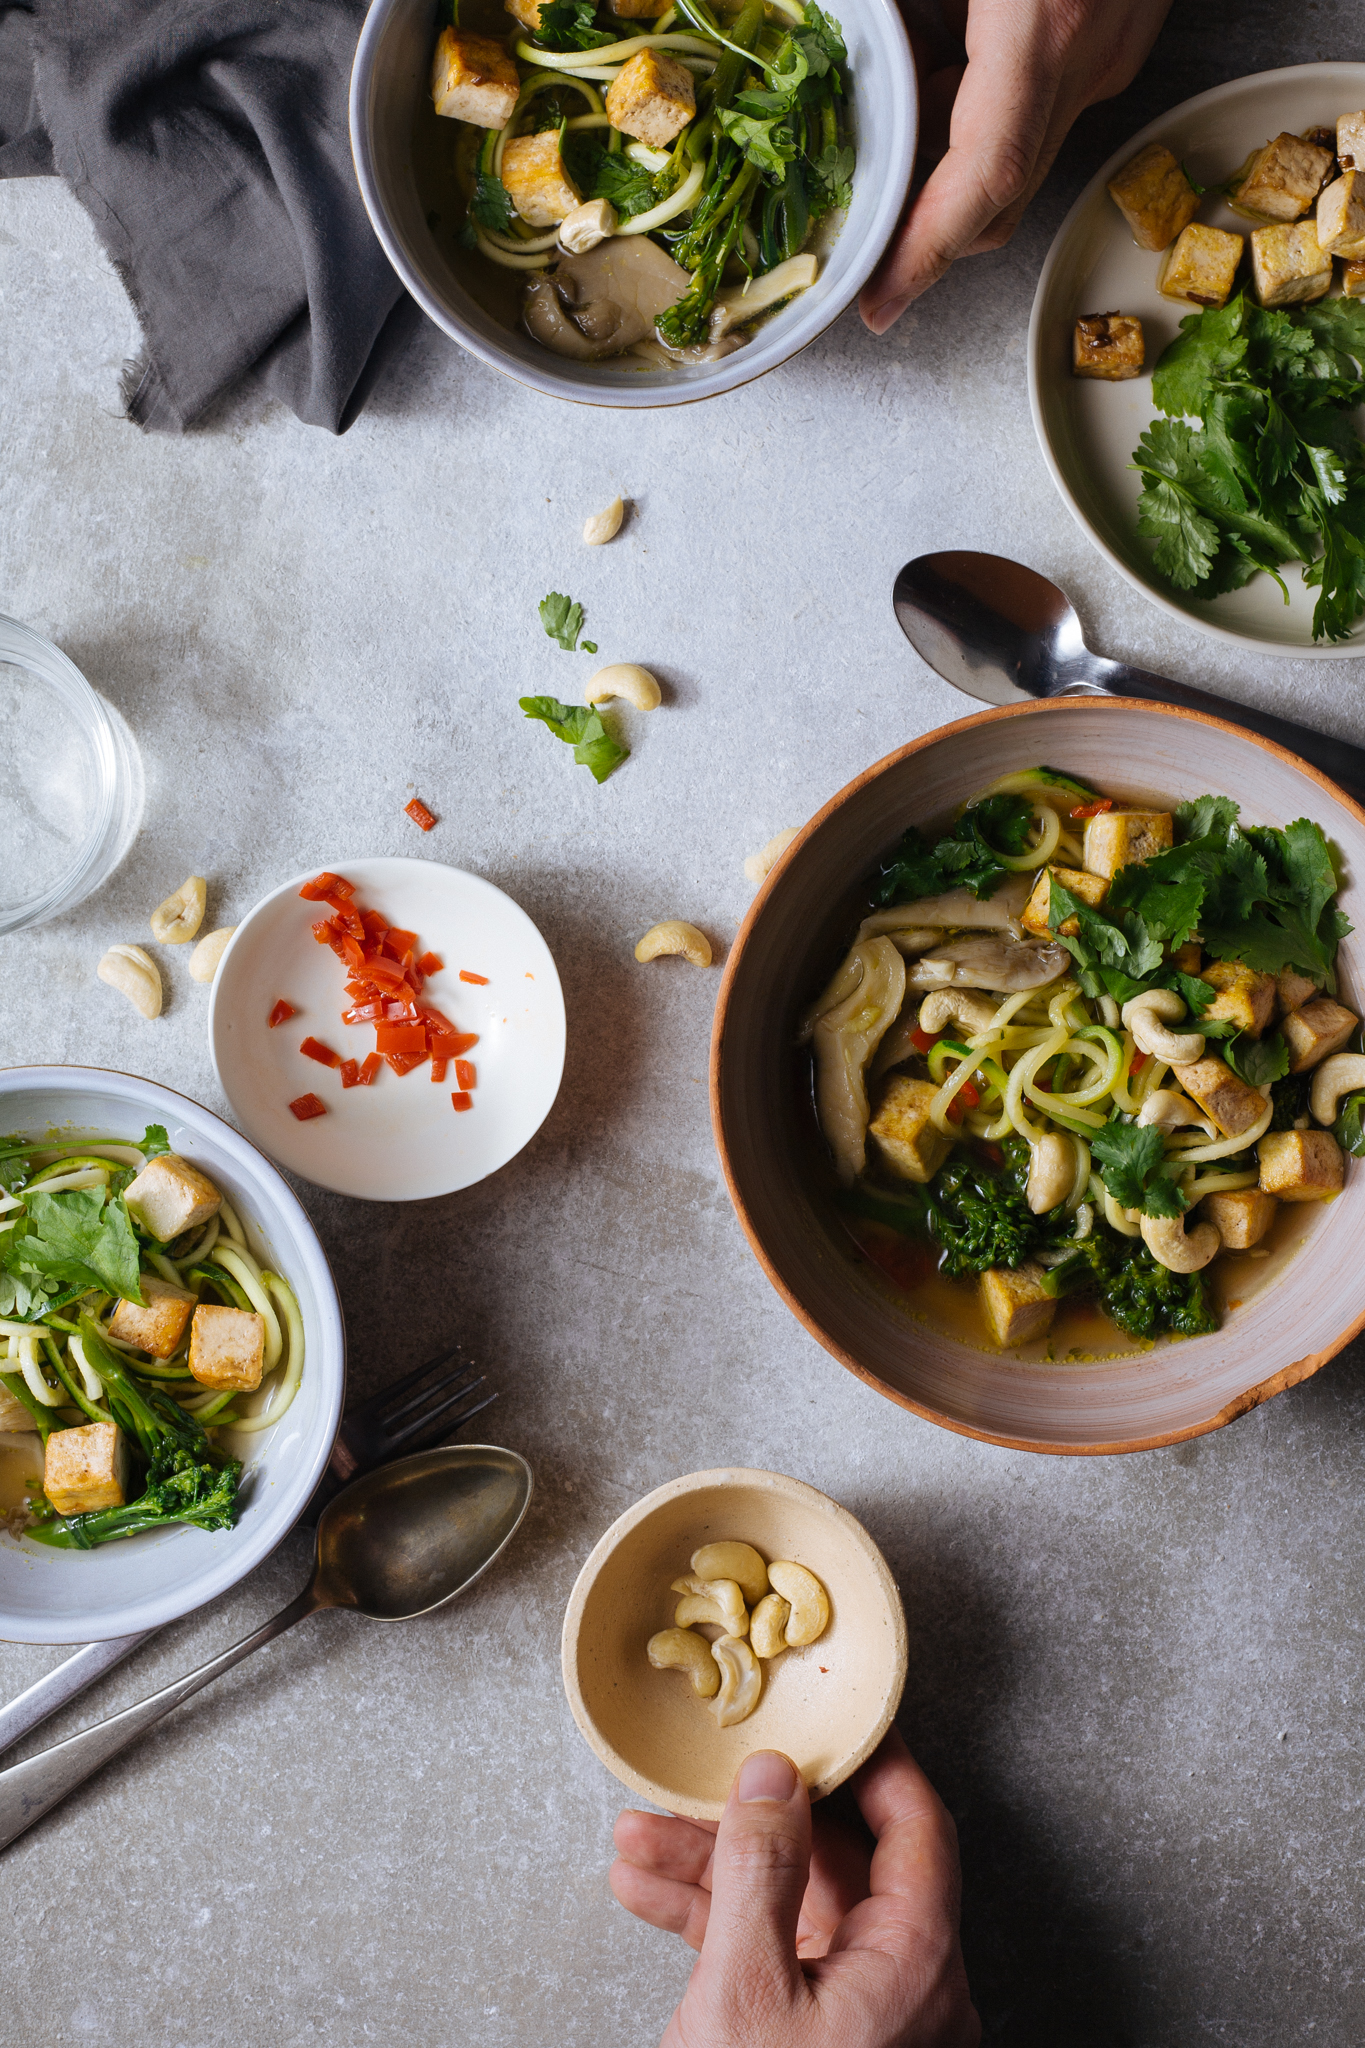 Sopa vietnamita com noodles de courgette, caju e tofu salteado